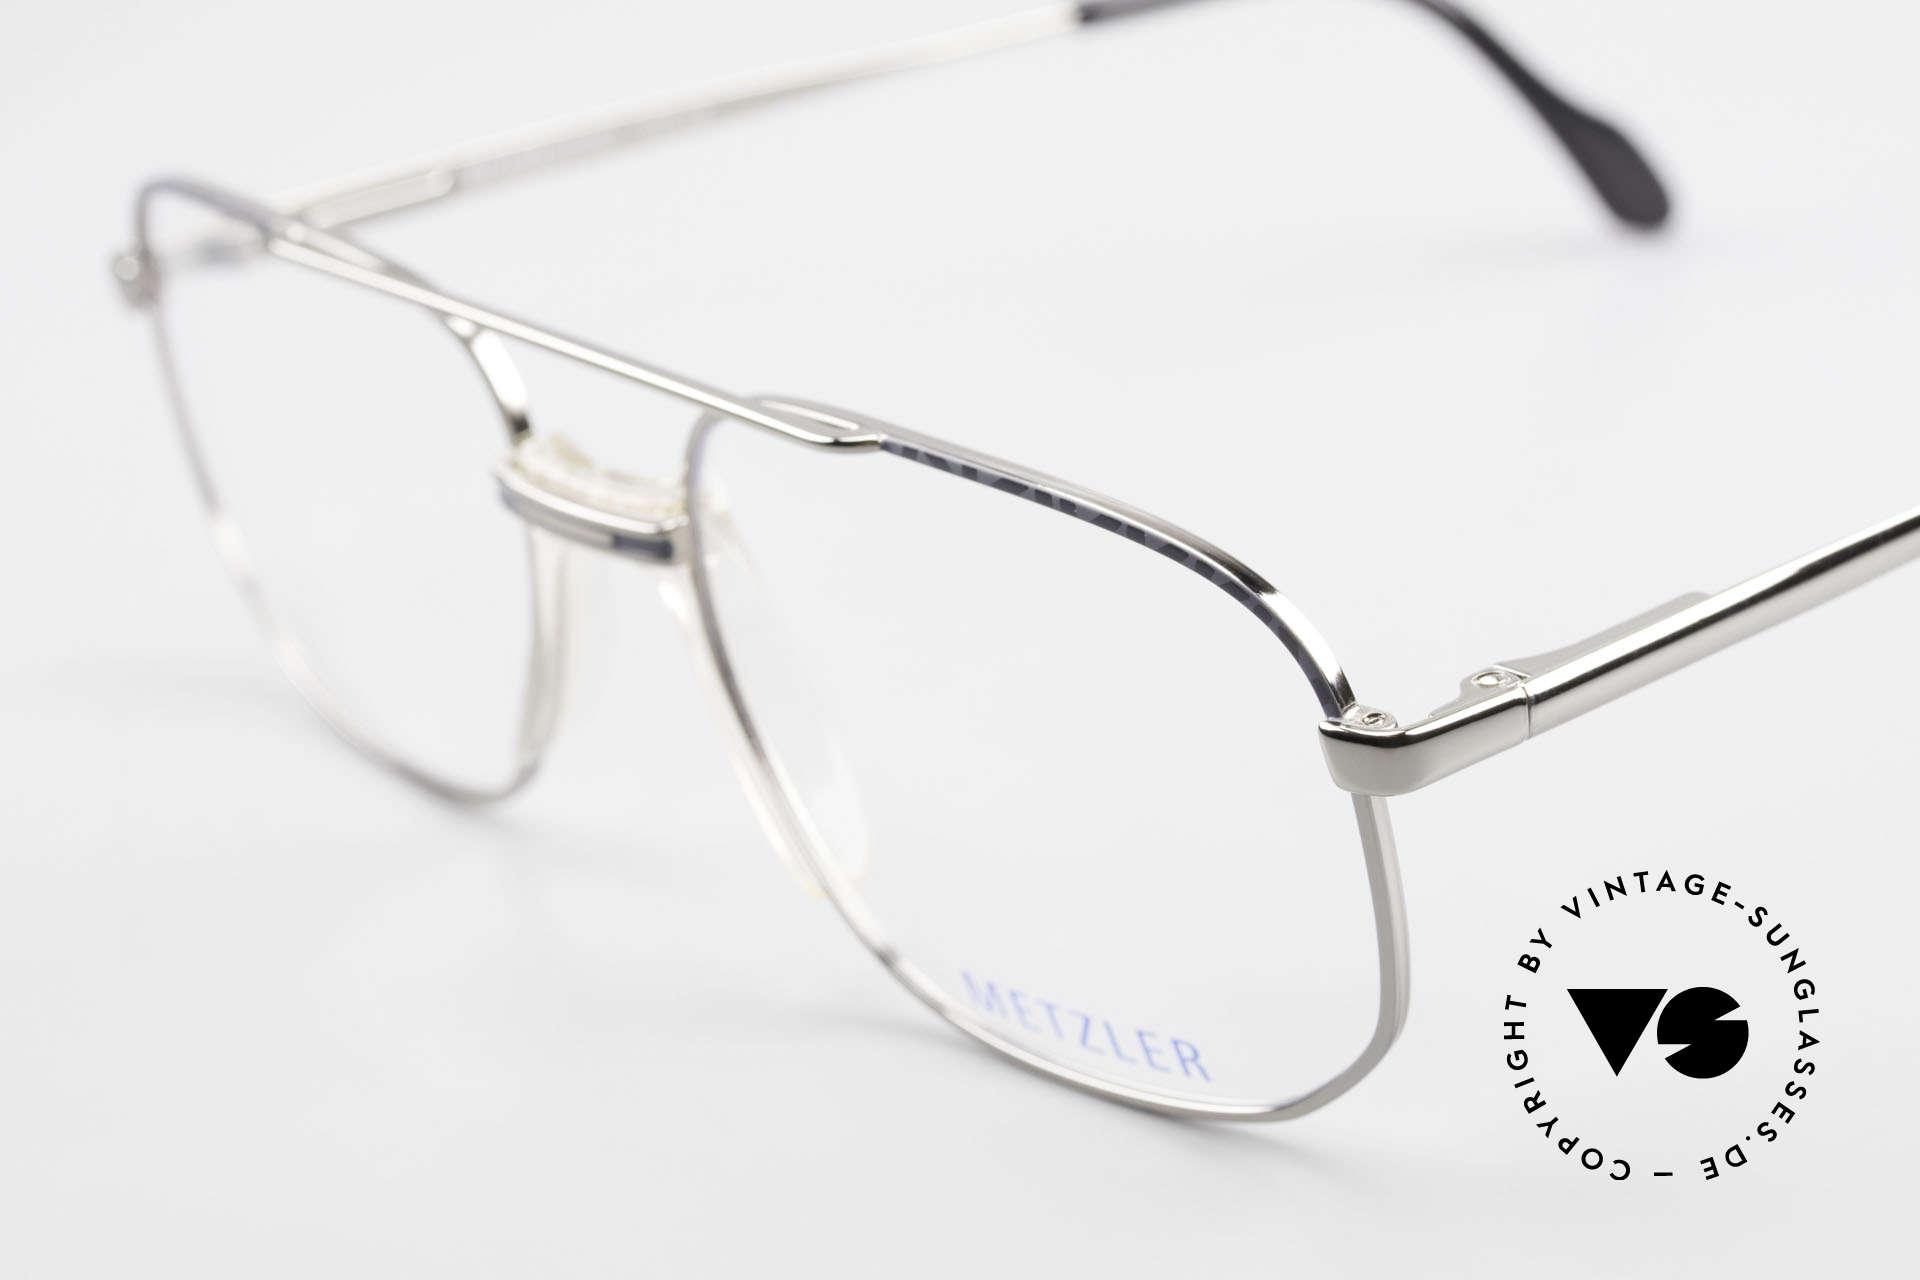 Metzler 7538 Metal Frame With Saddle Bridge, unworn (like all our rare vintage 90's eyeglasses), Made for Men